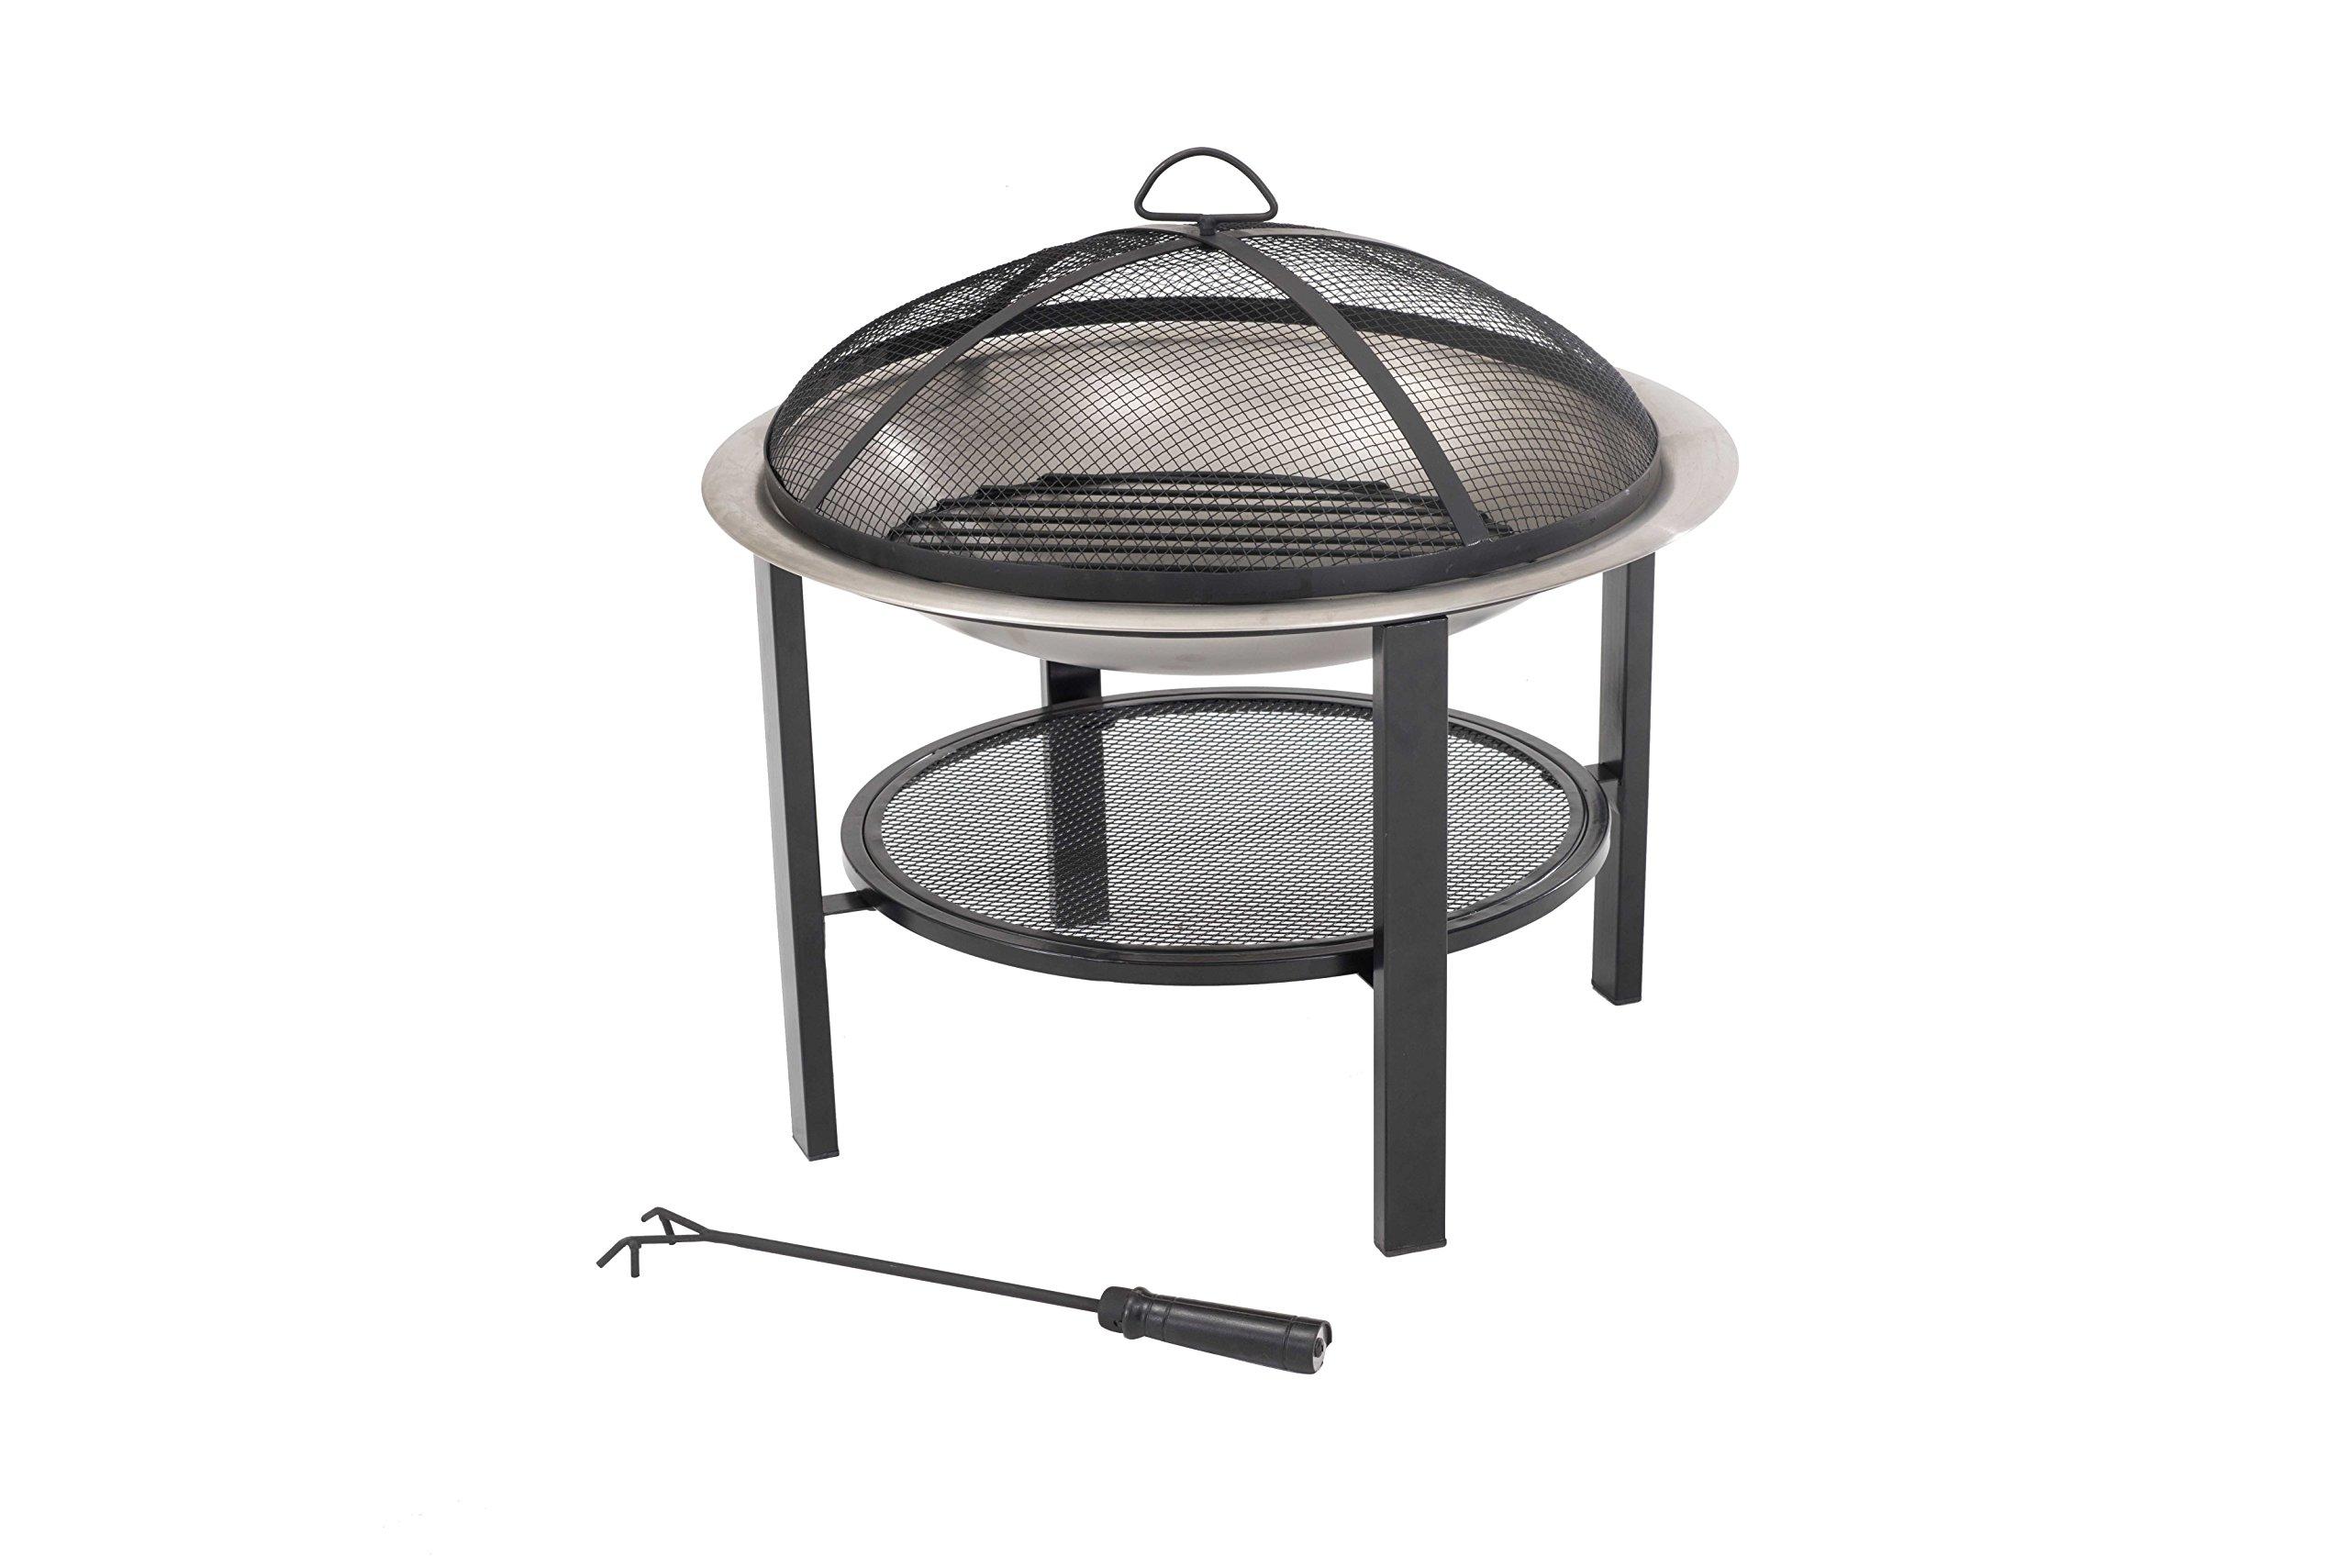 Sunjoy 26'' Verde Stainless Steel Fire Pit by Sunjoy